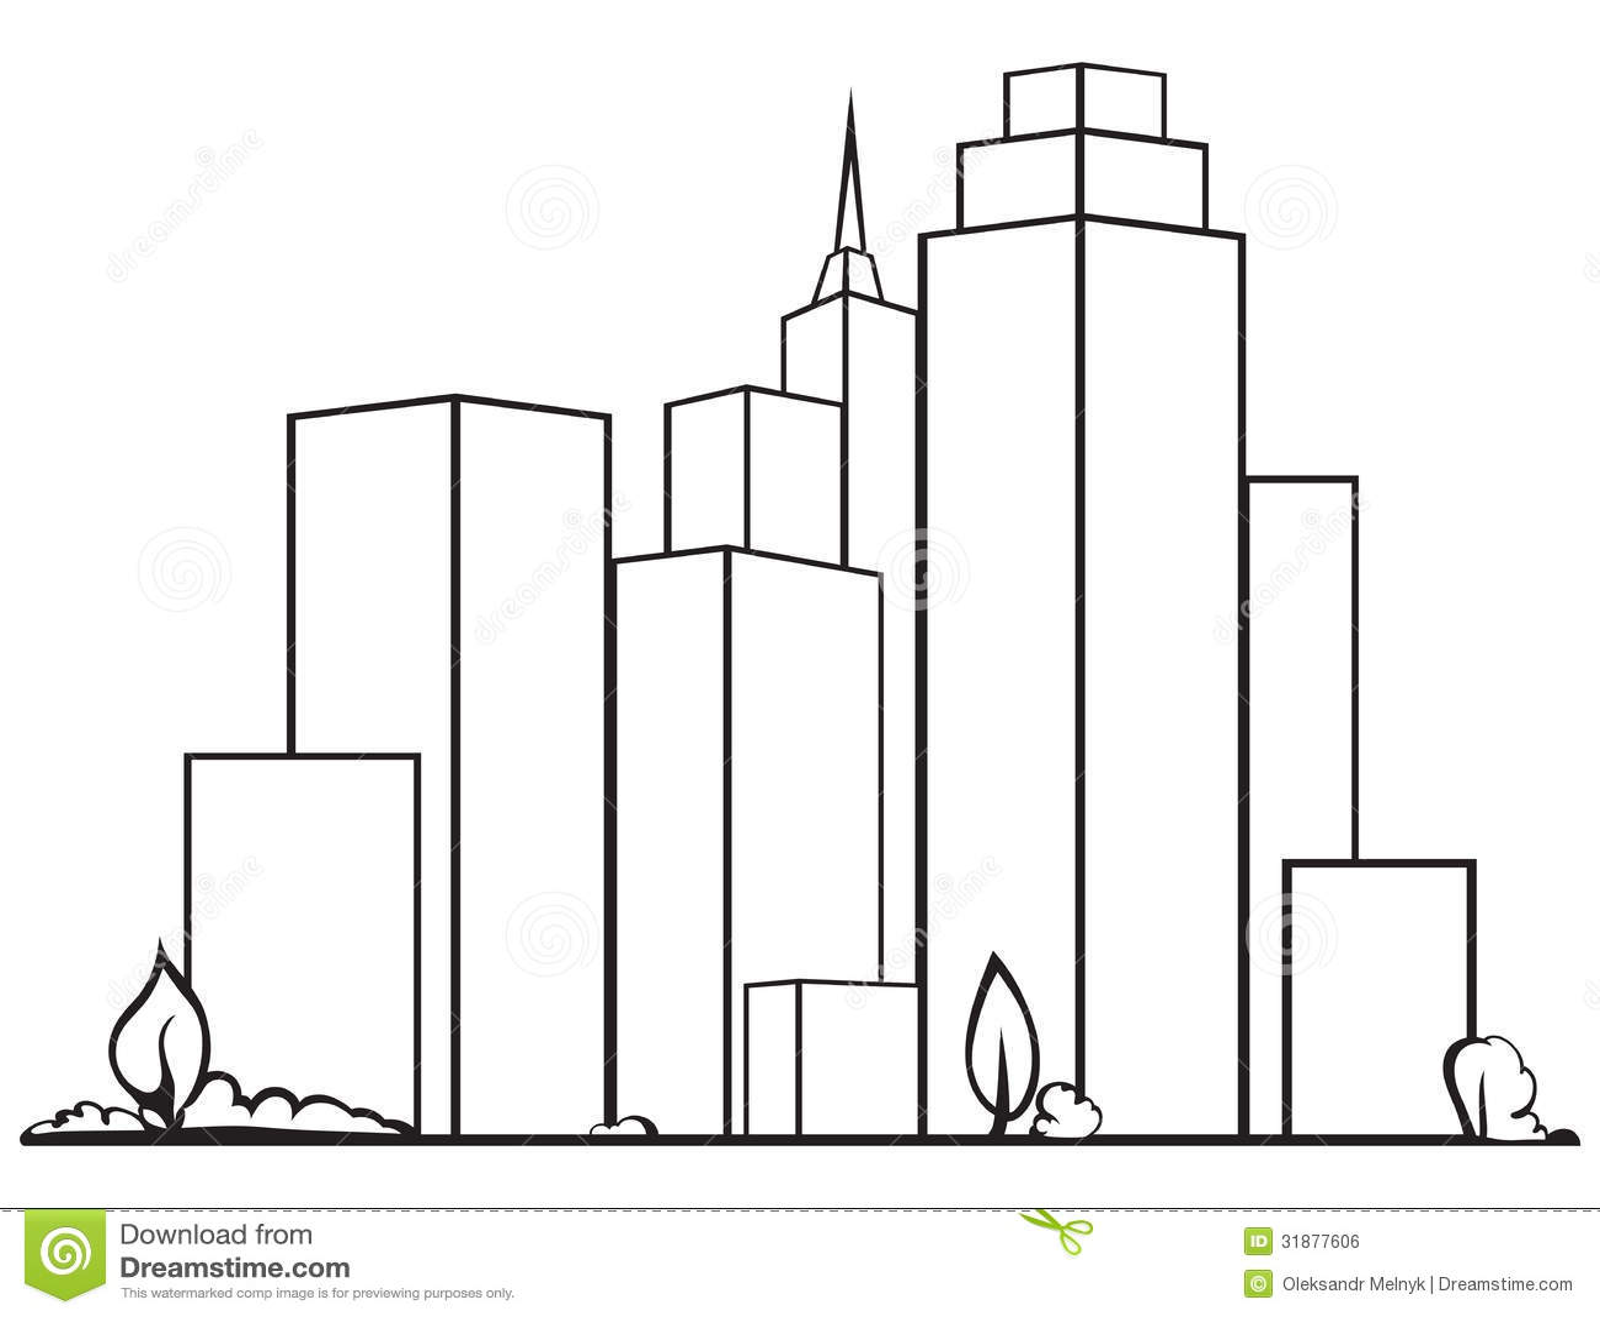 Urban Cityscape Royalty Free Stock Image Image 31877606